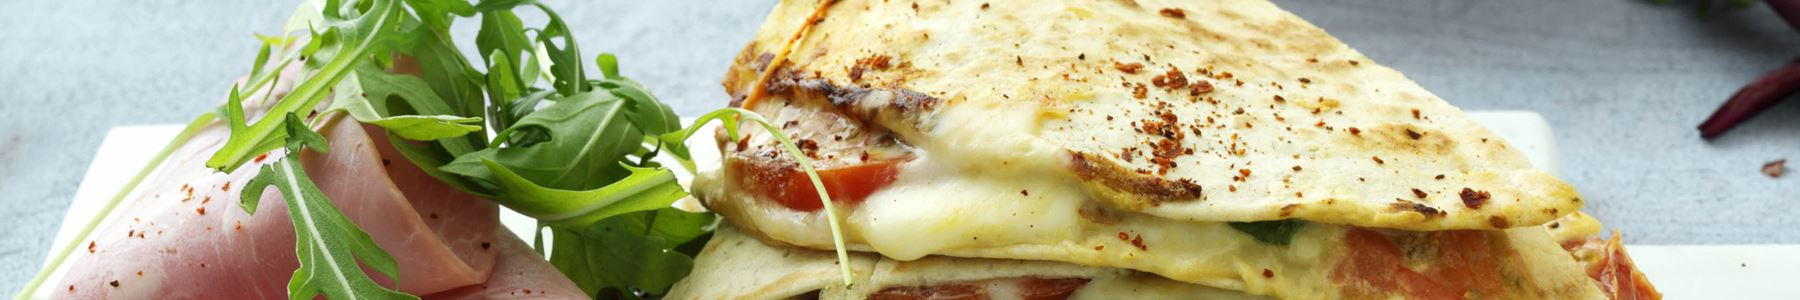 Vegetarisk madplan + Morgenmad